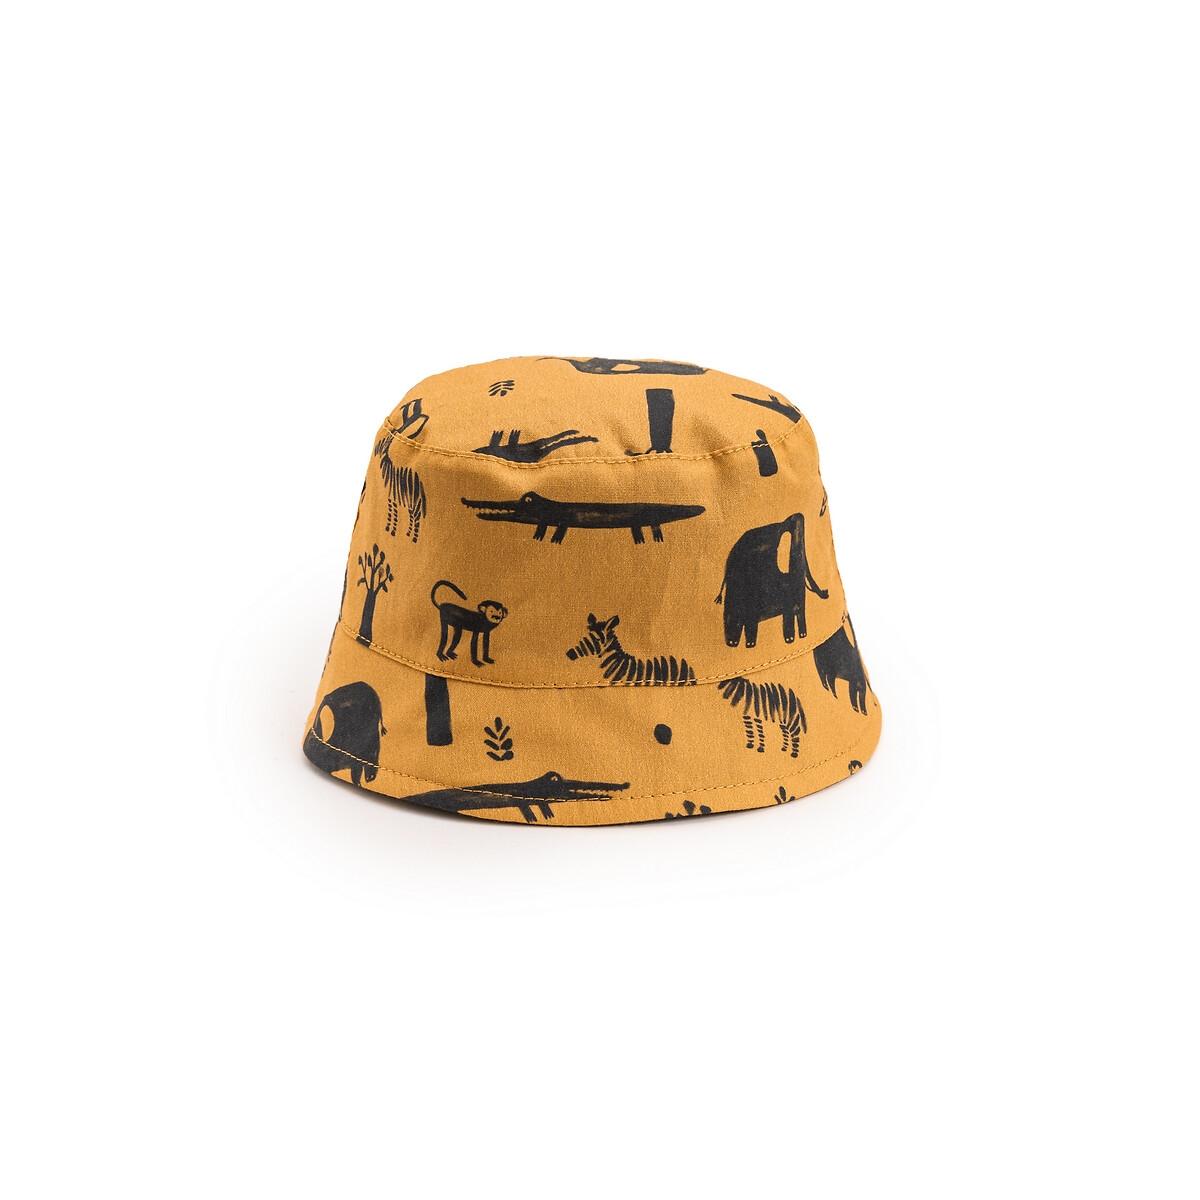 Фото - Шляпка LaRedoute Двусторонняя 0 мес - 3 года 0/3 мес. - 50/60 см желтый брюки laredoute из мольтона с бантом 1 мес 3 года 9 мес 71 см розовый